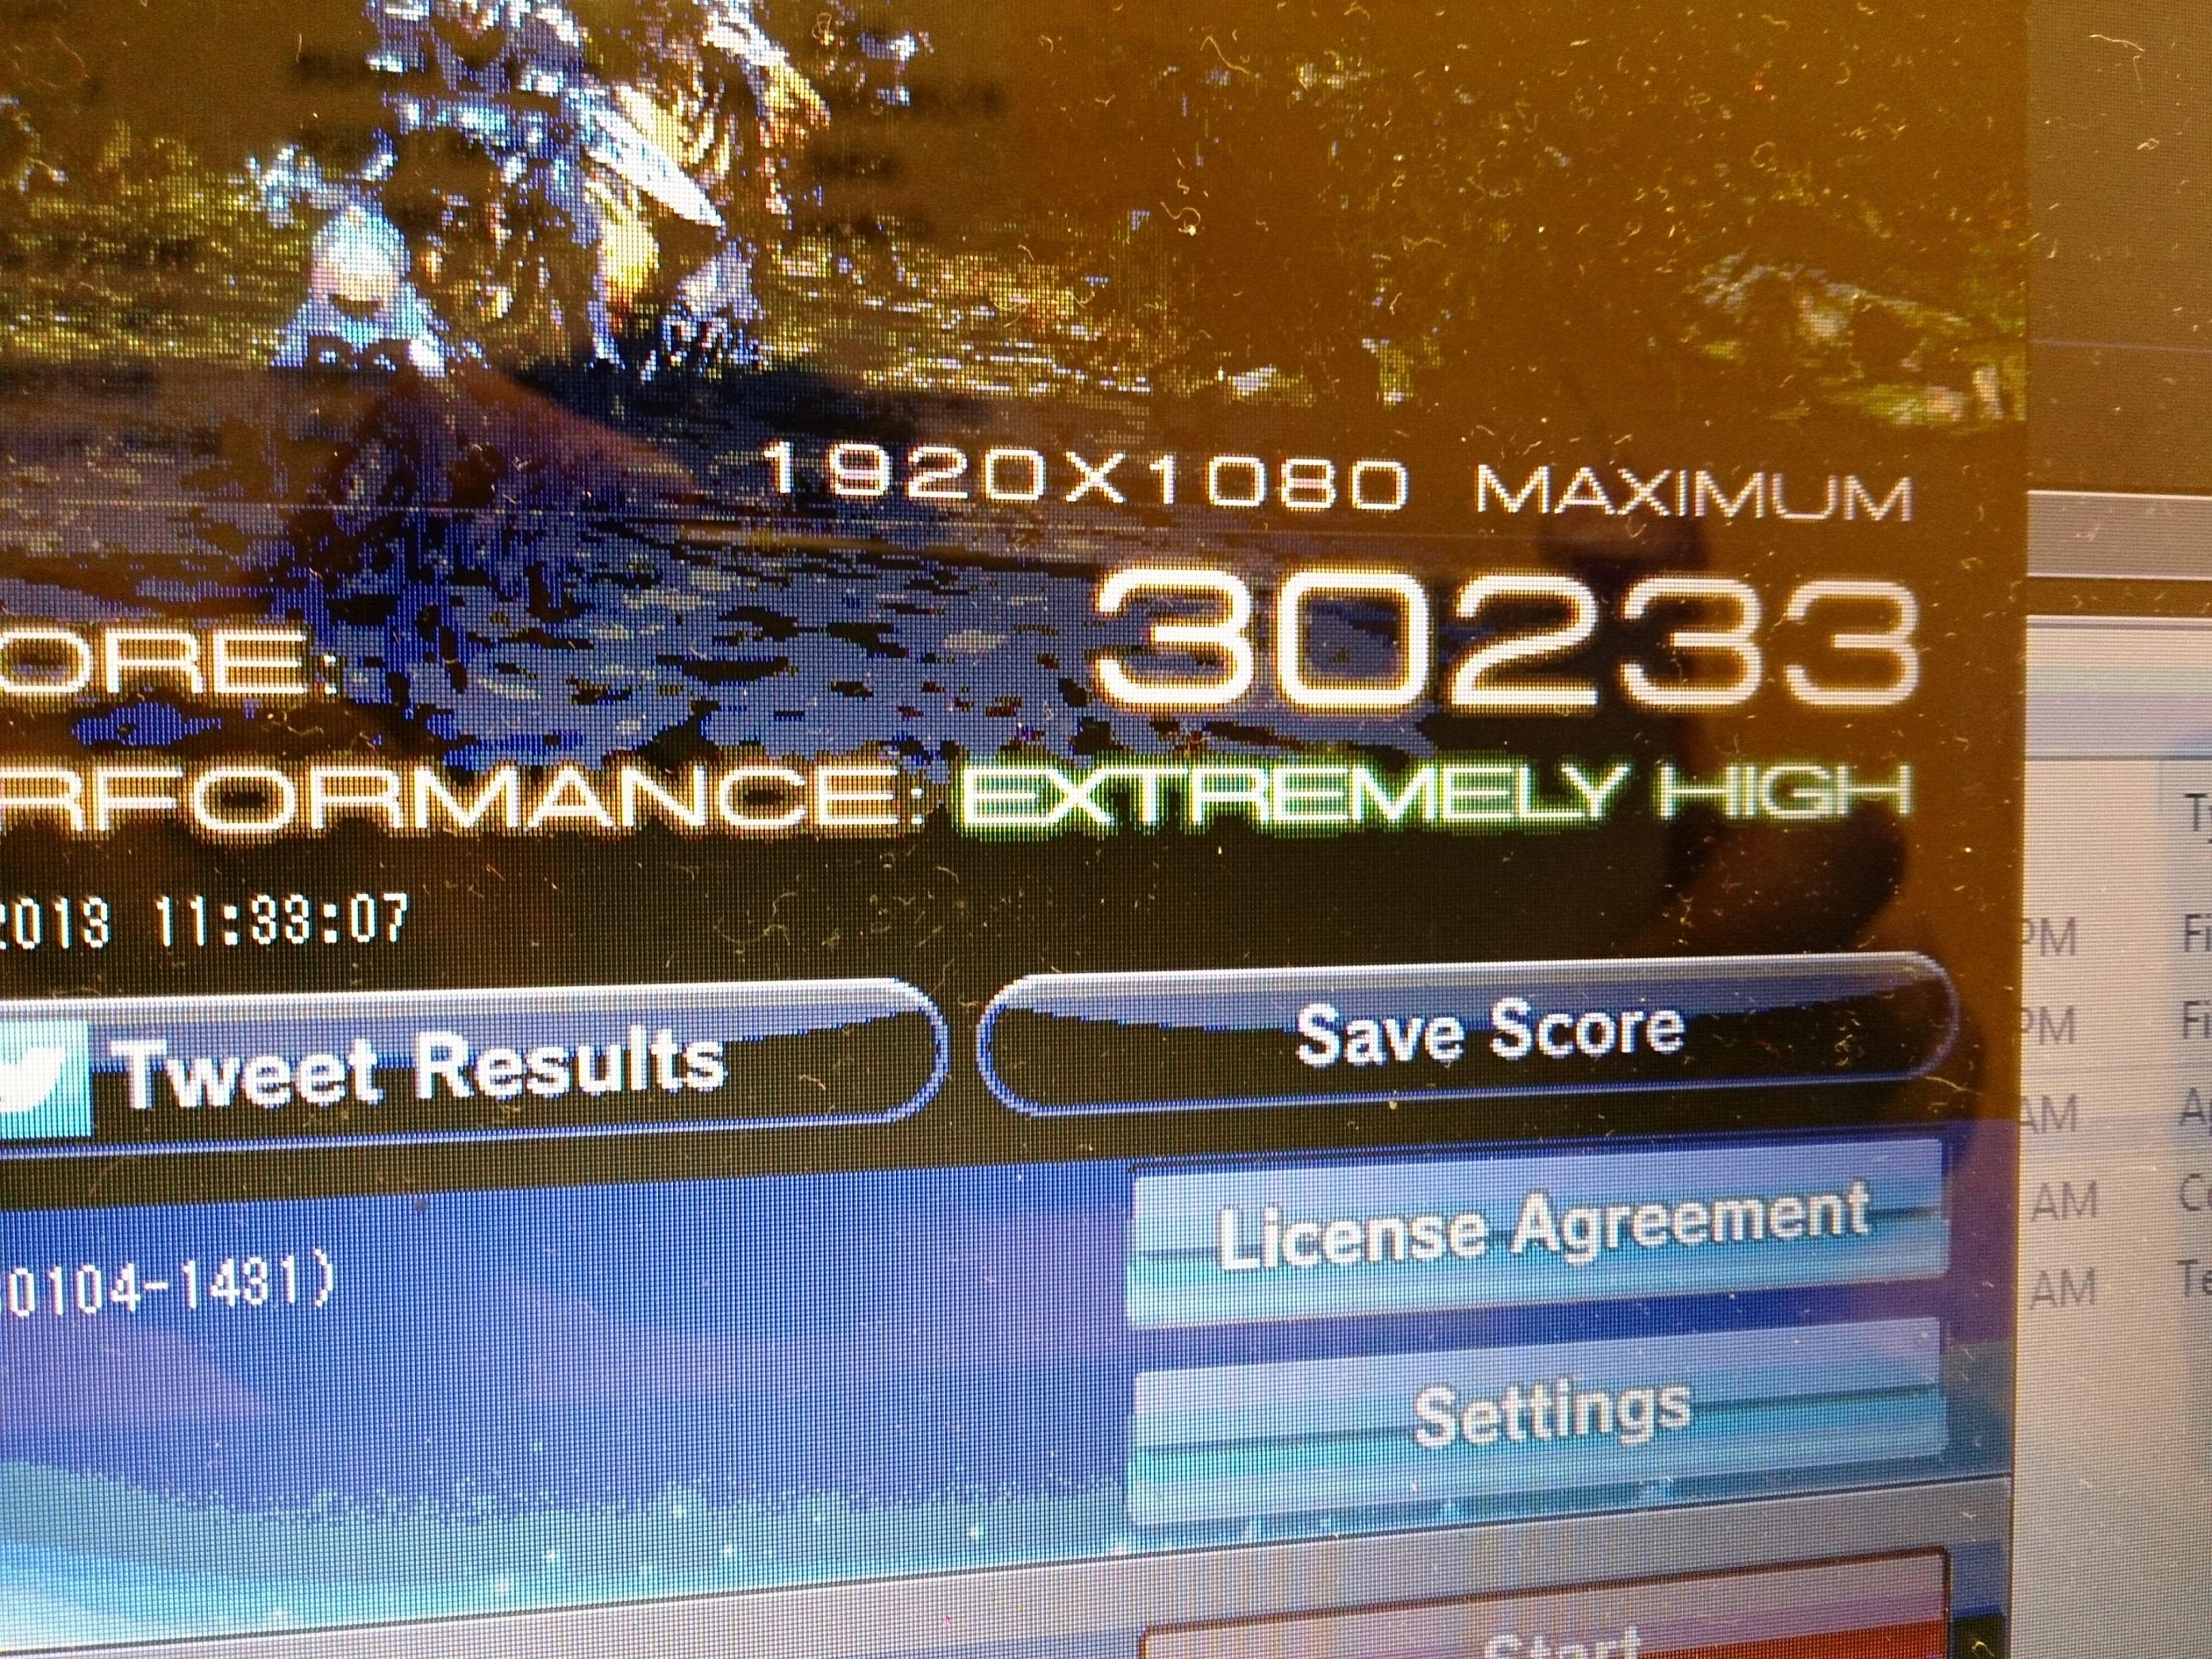 kurokikaze ffxiv looks better lv30 than voice hair choices rip lv20 gear creation character scores benchmark lv40 with